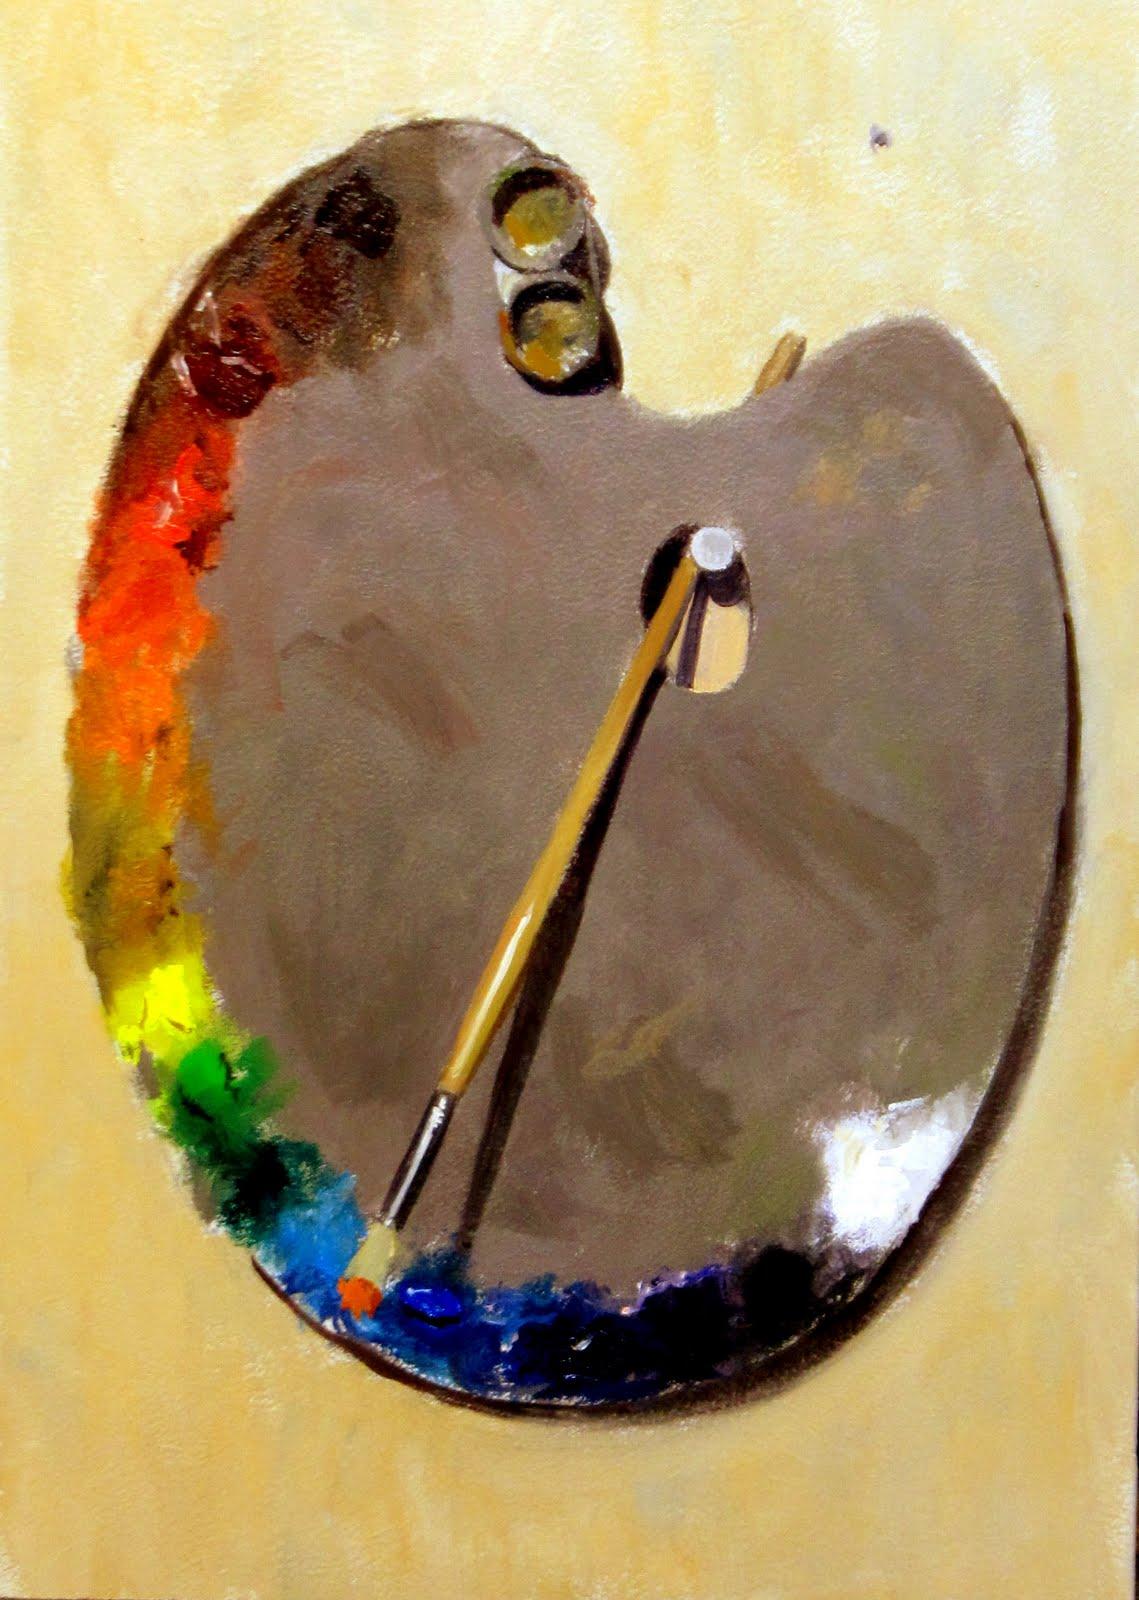 """ART 4 DIAPERS (DAILY DIAPER #169) Tools of The Trade 2011"" original fine art by Brian Burt"